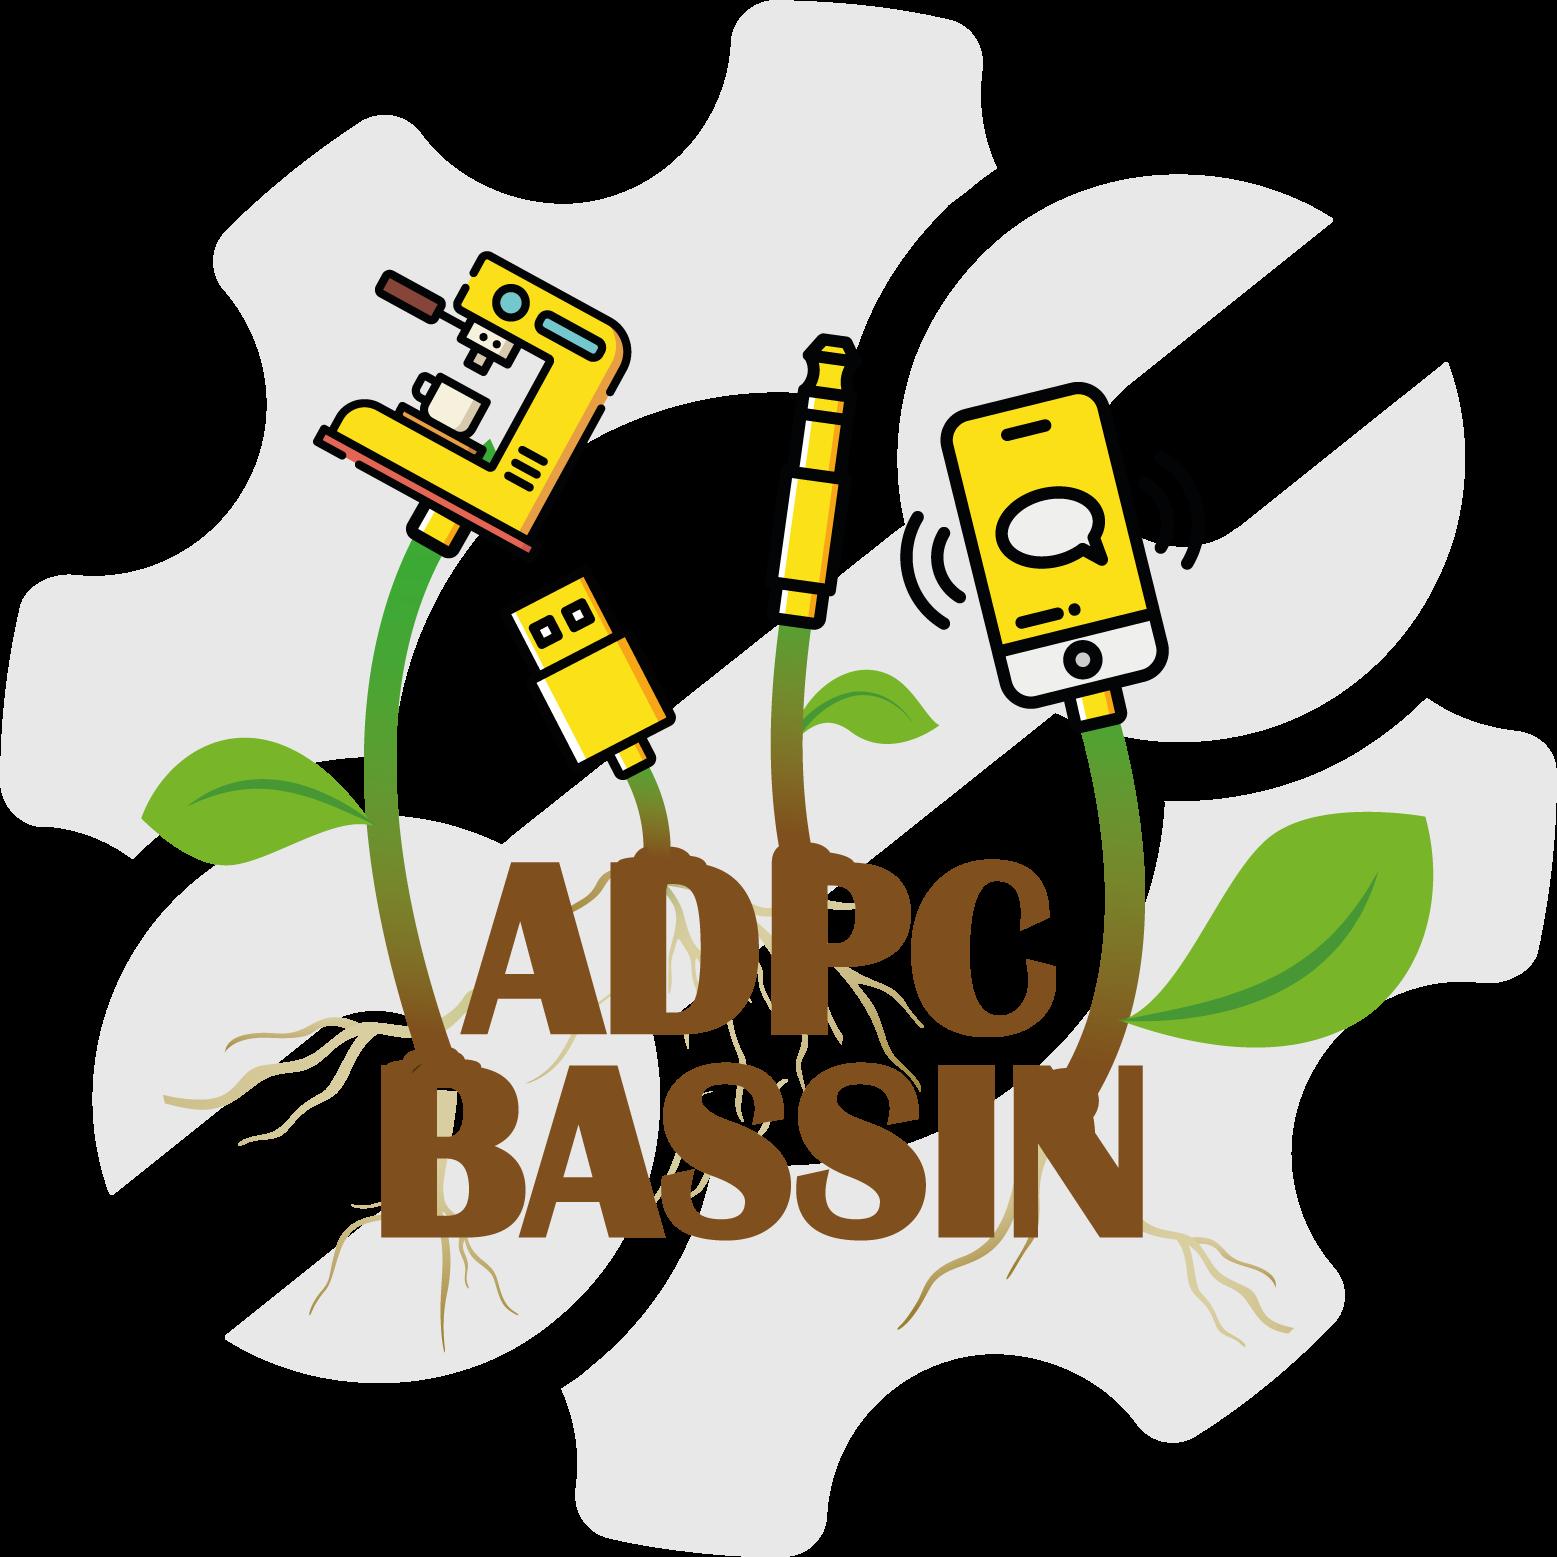 ADPC Bassin